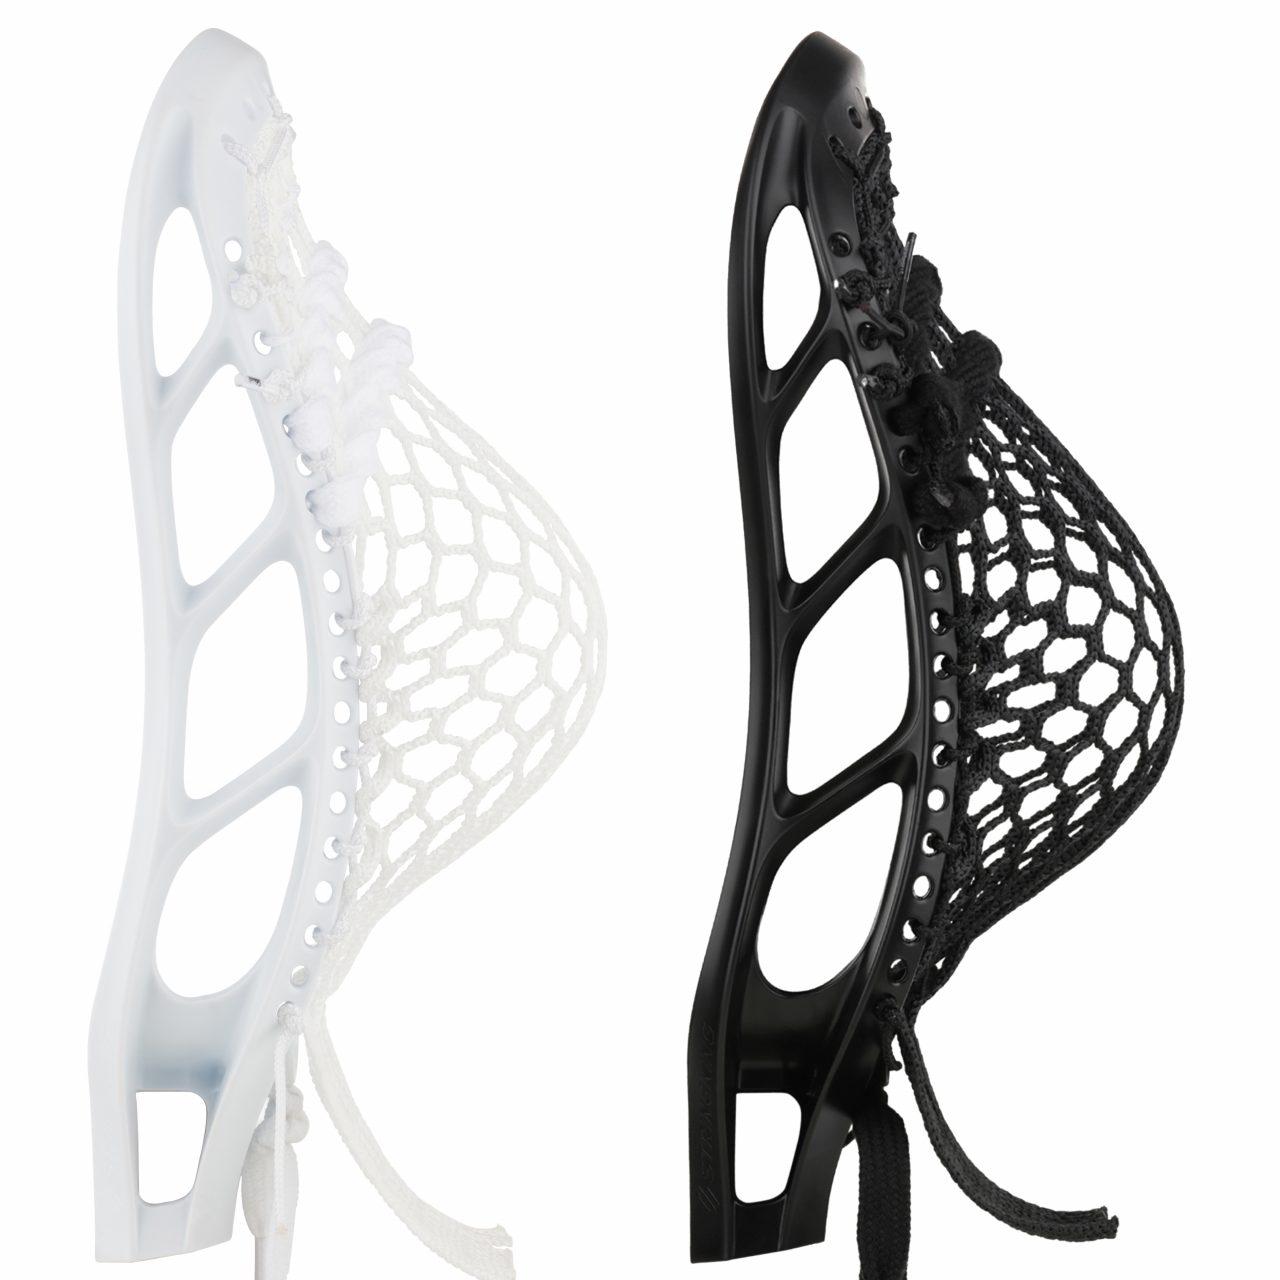 Mark 1 Lacrosse Head Black White Strung Product Image